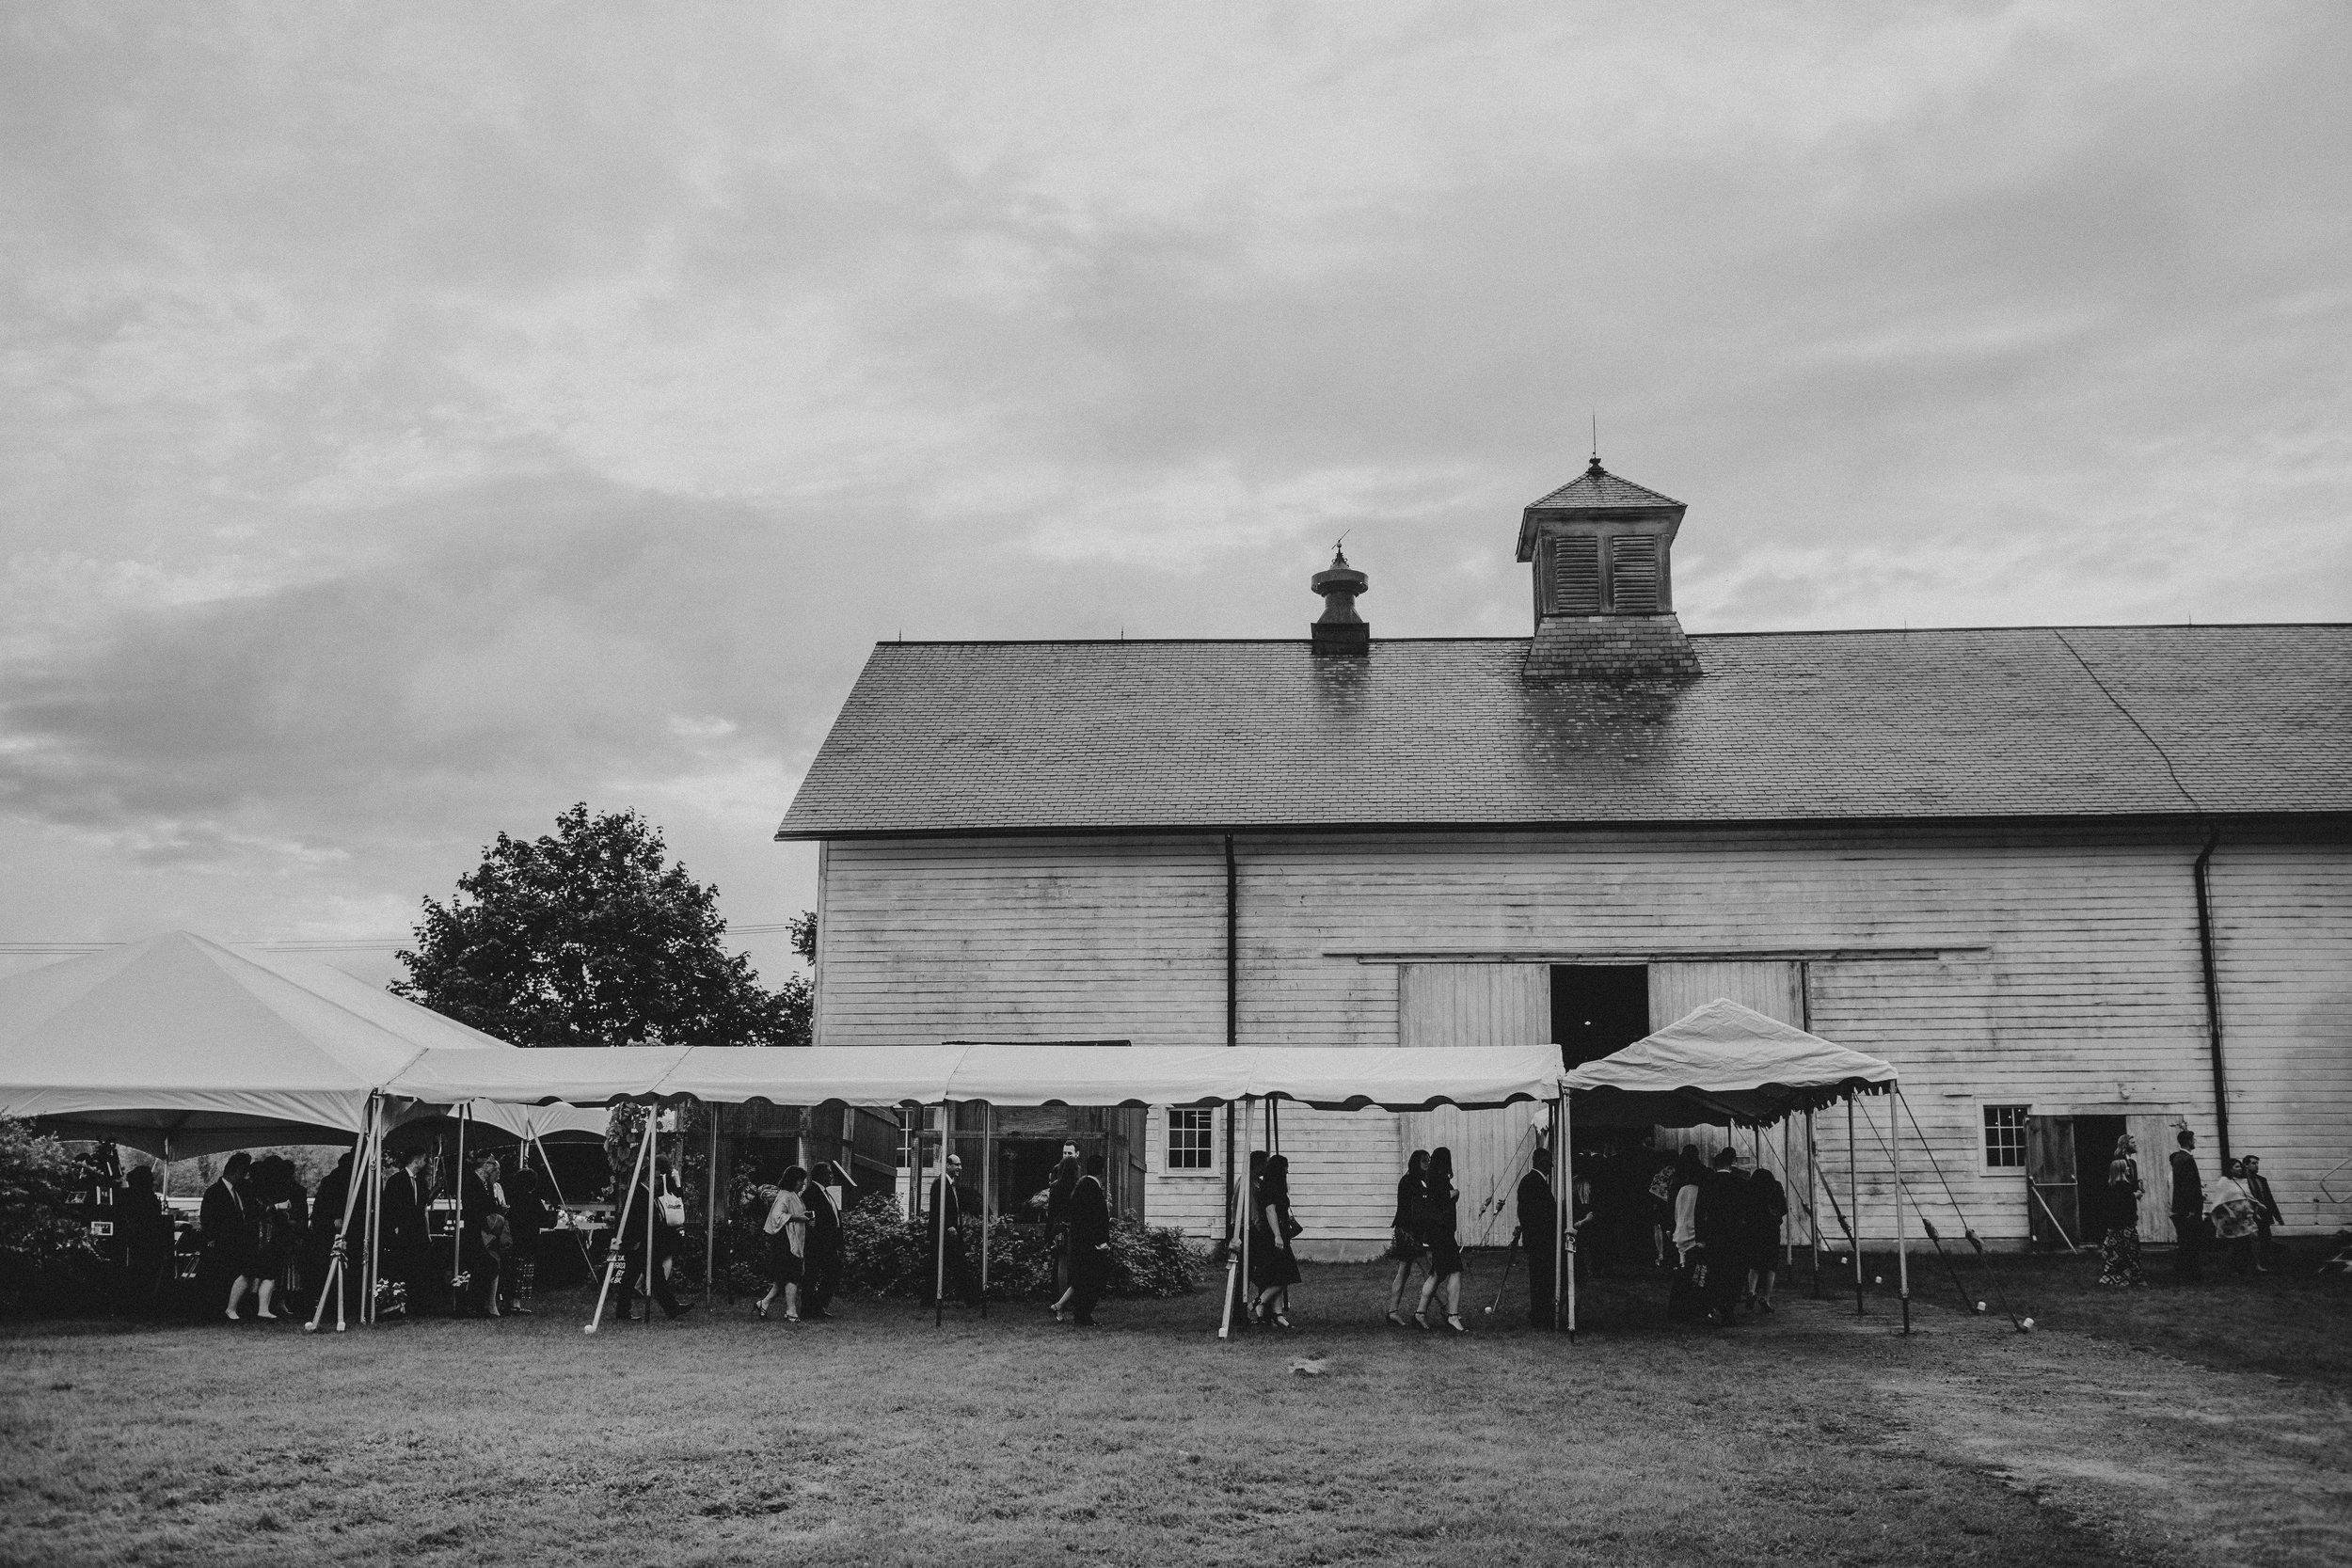 shaker_heritage_barn_007.JPG